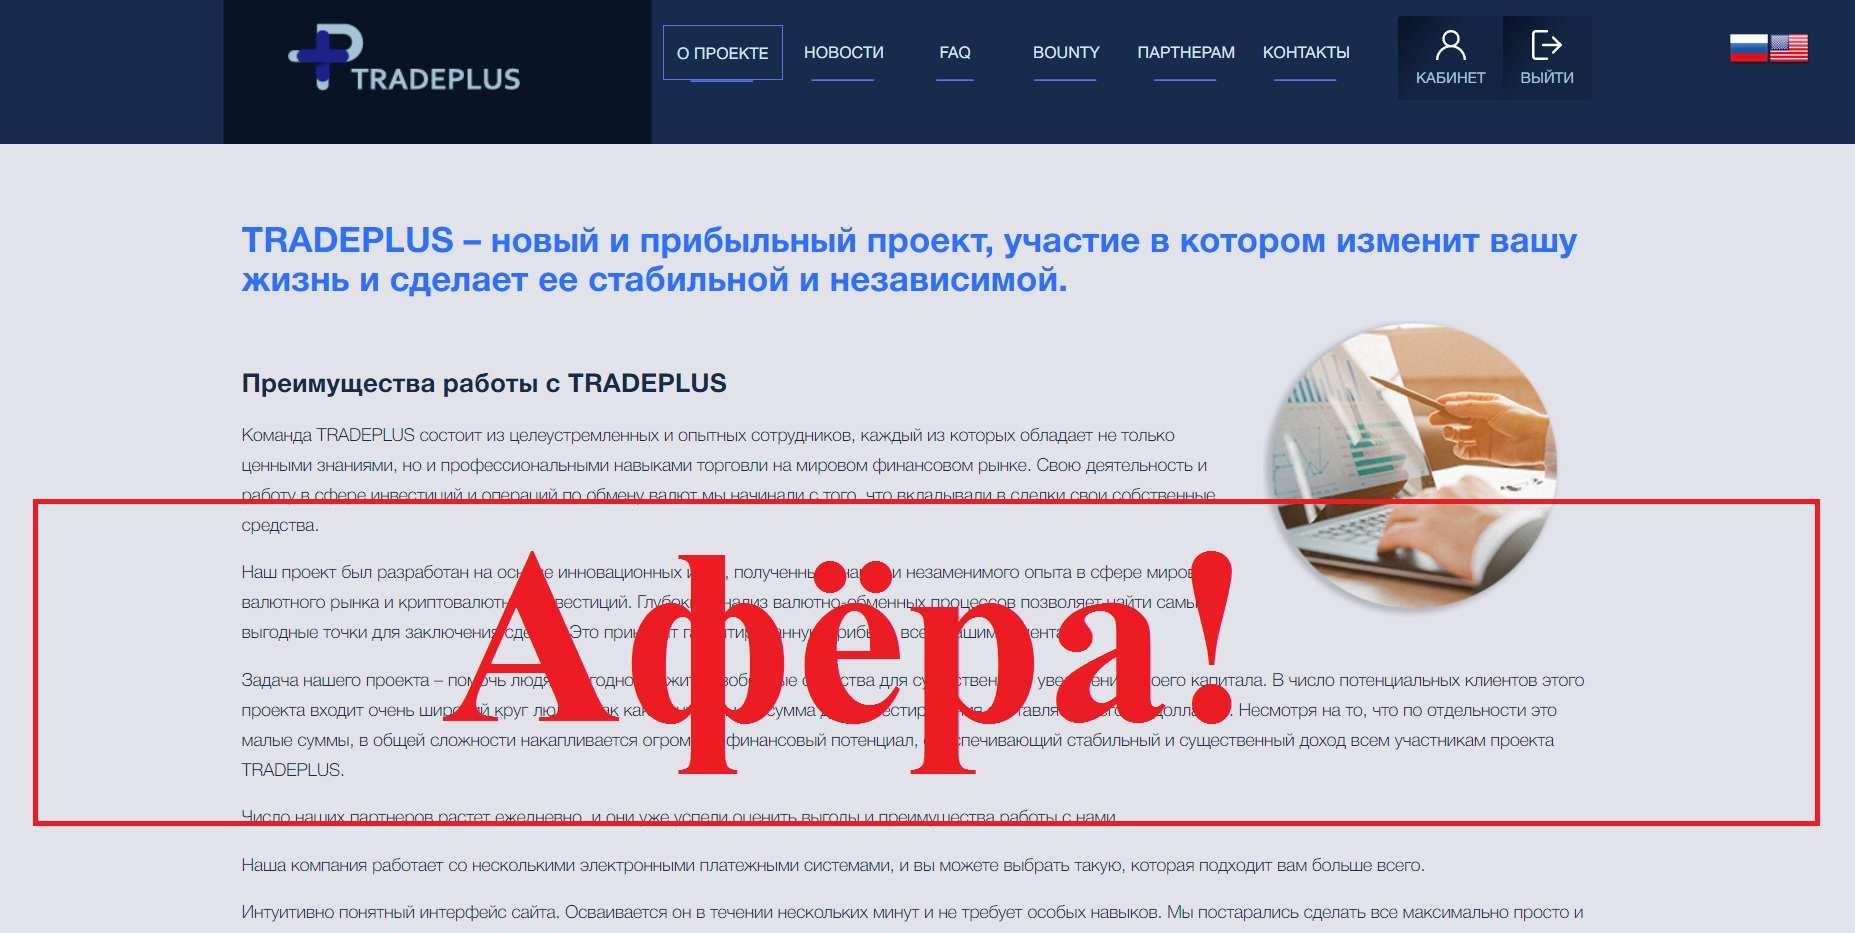 Tradeplus – обзор и отзывы о tradeplus.vip